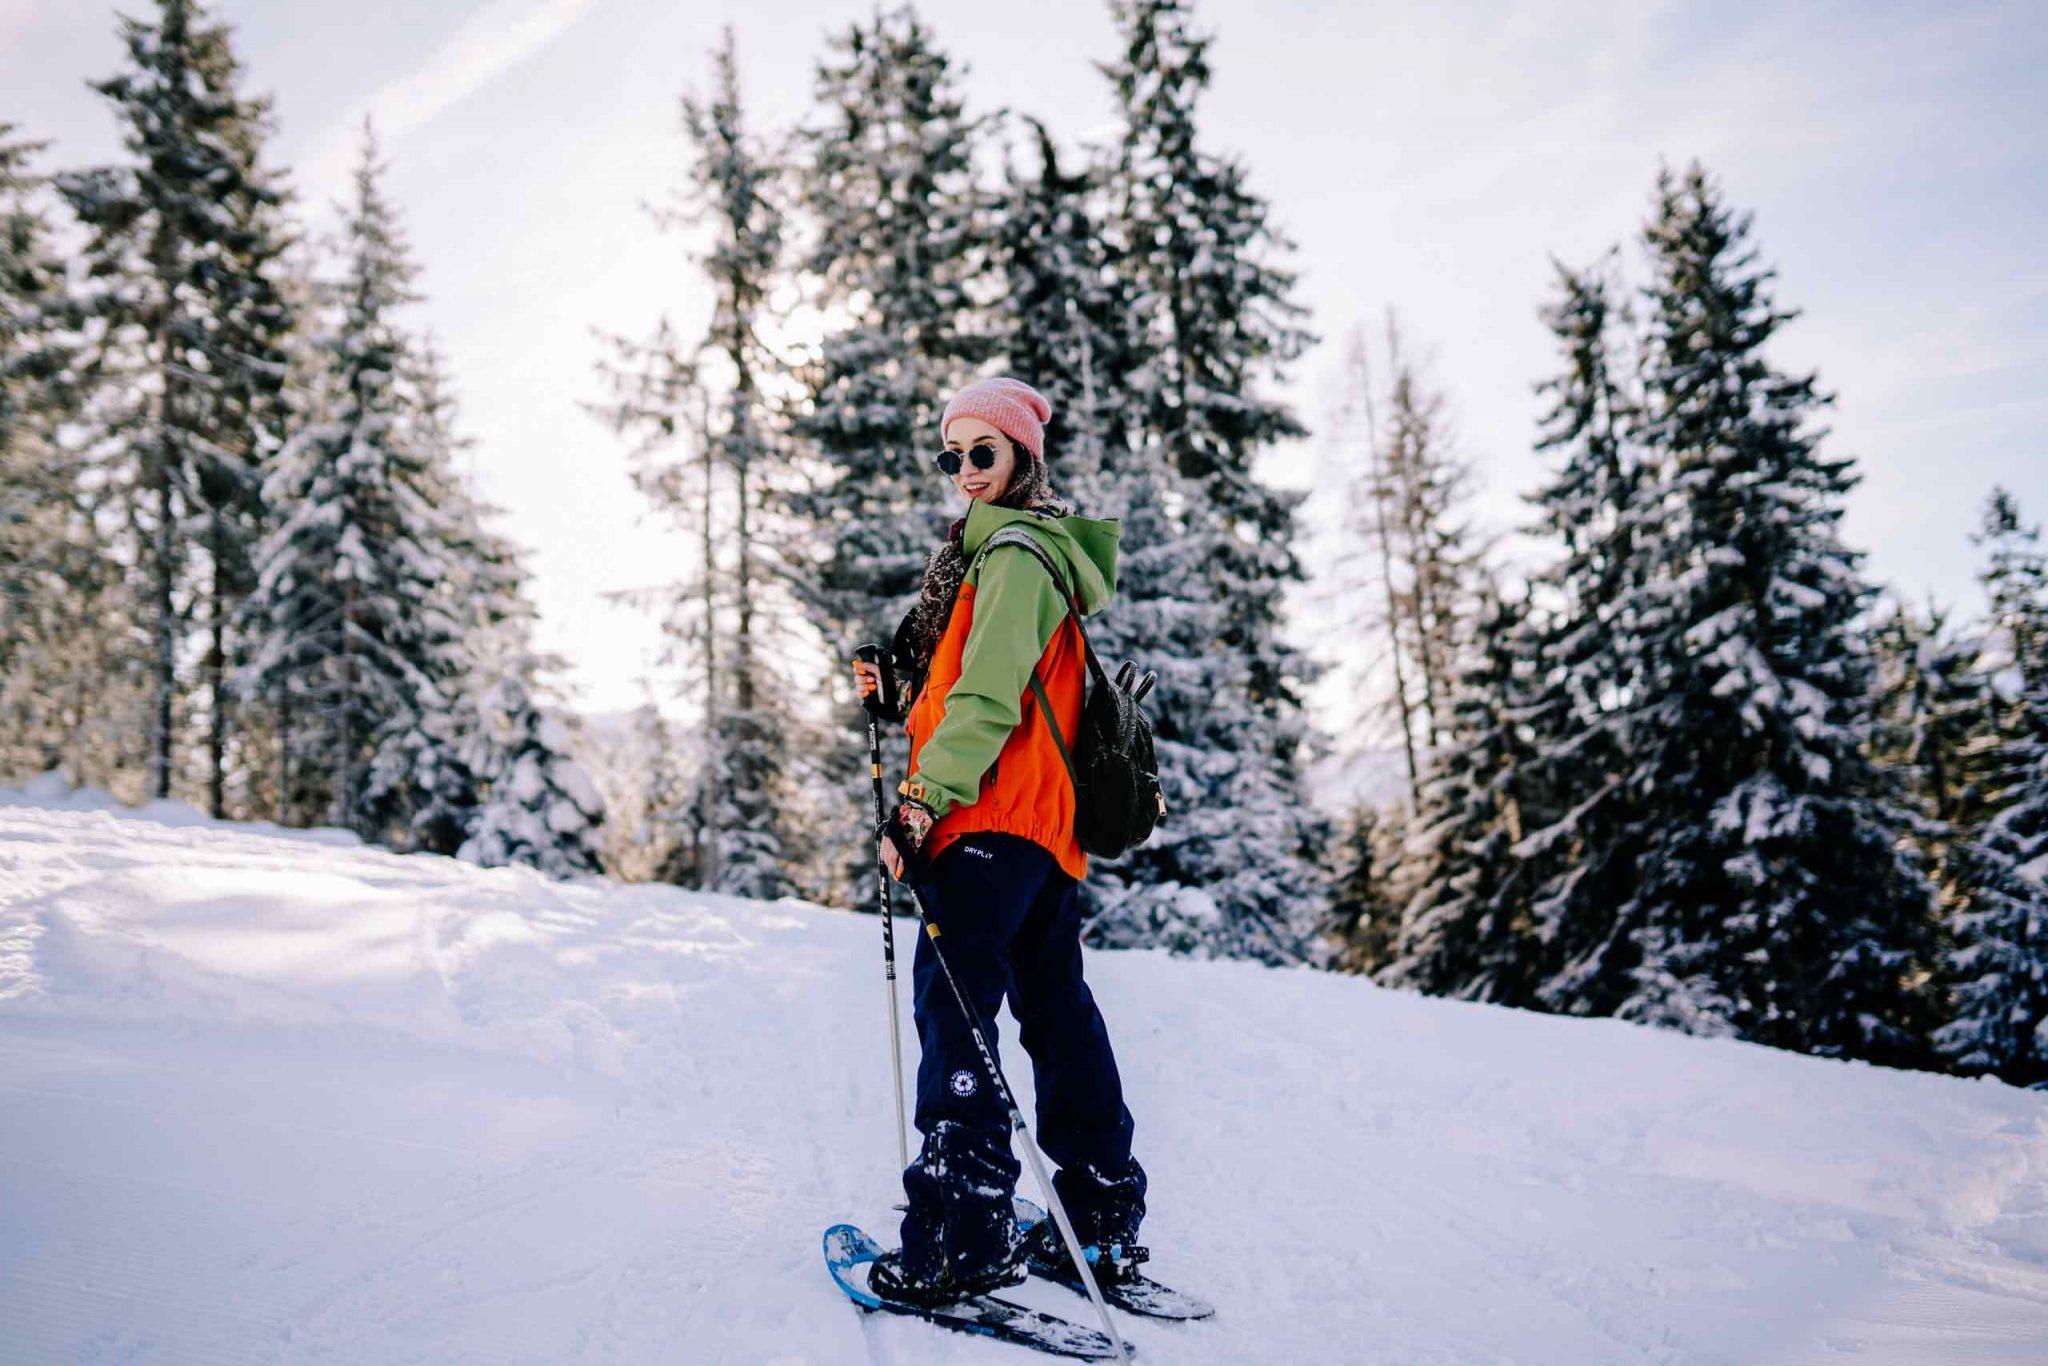 Levis_Austria_Ski_Trip_Ilsoo_van_Dijk_ISVD_10122019-03008